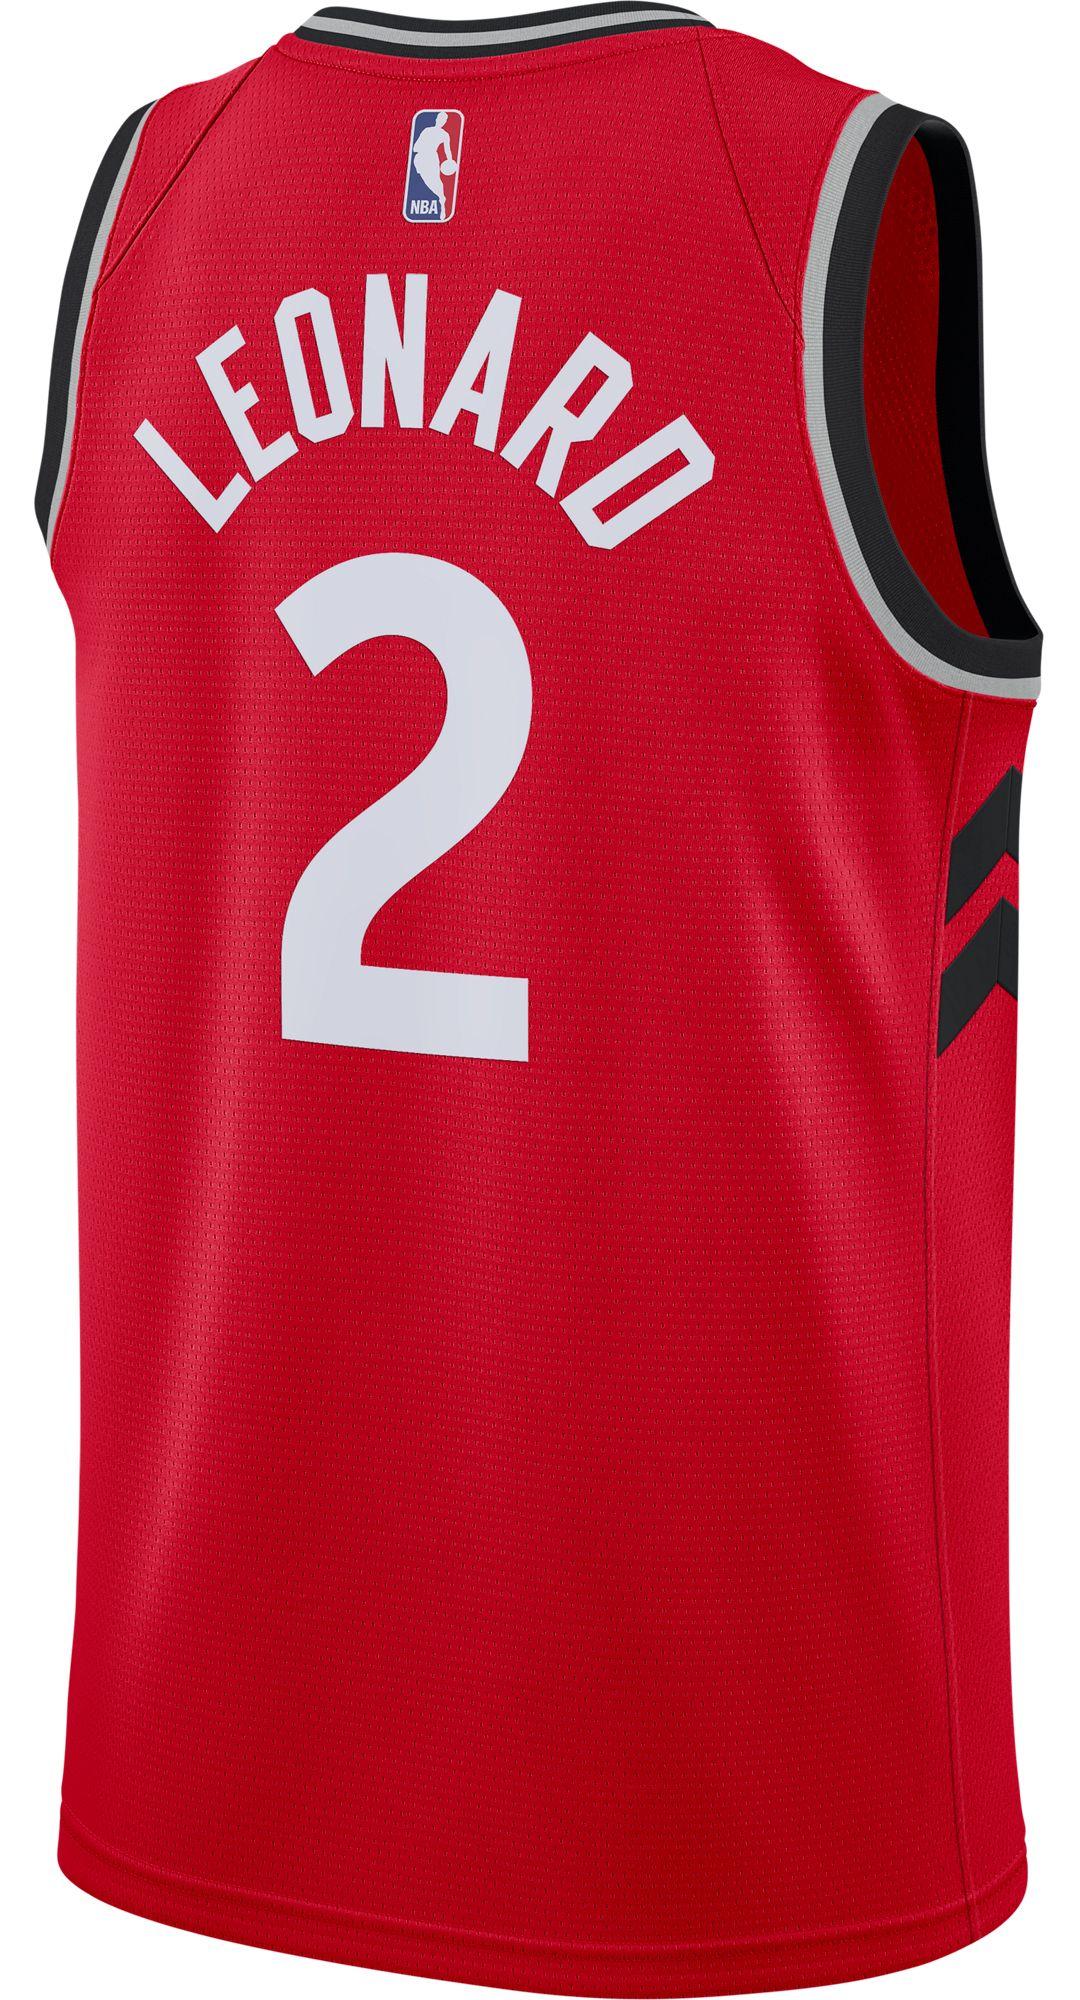 a3e61c700fab Nike Men s Toronto Raptors Kawhi Leonard  2 Red Dri-FIT Swingman Jersey 3